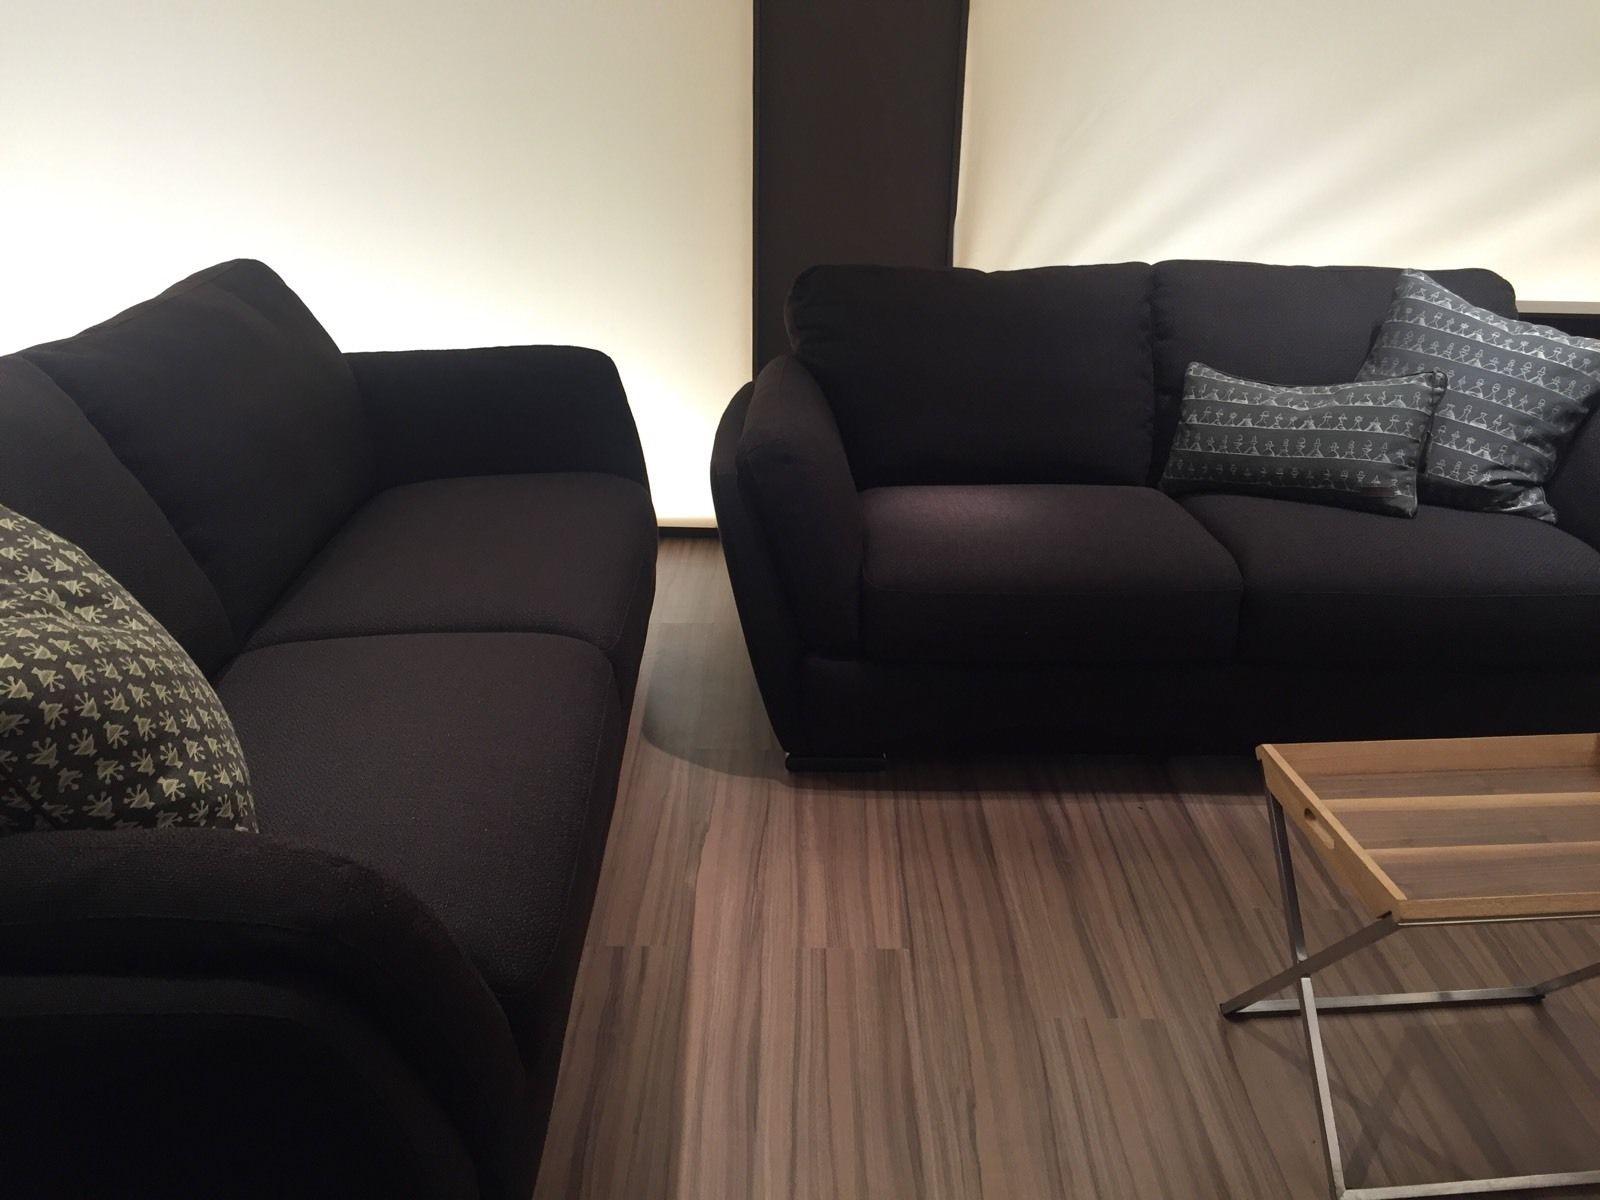 are natuzzi sofas good quality unique sofa sets for sale editions havanna 3 432 brown fabric